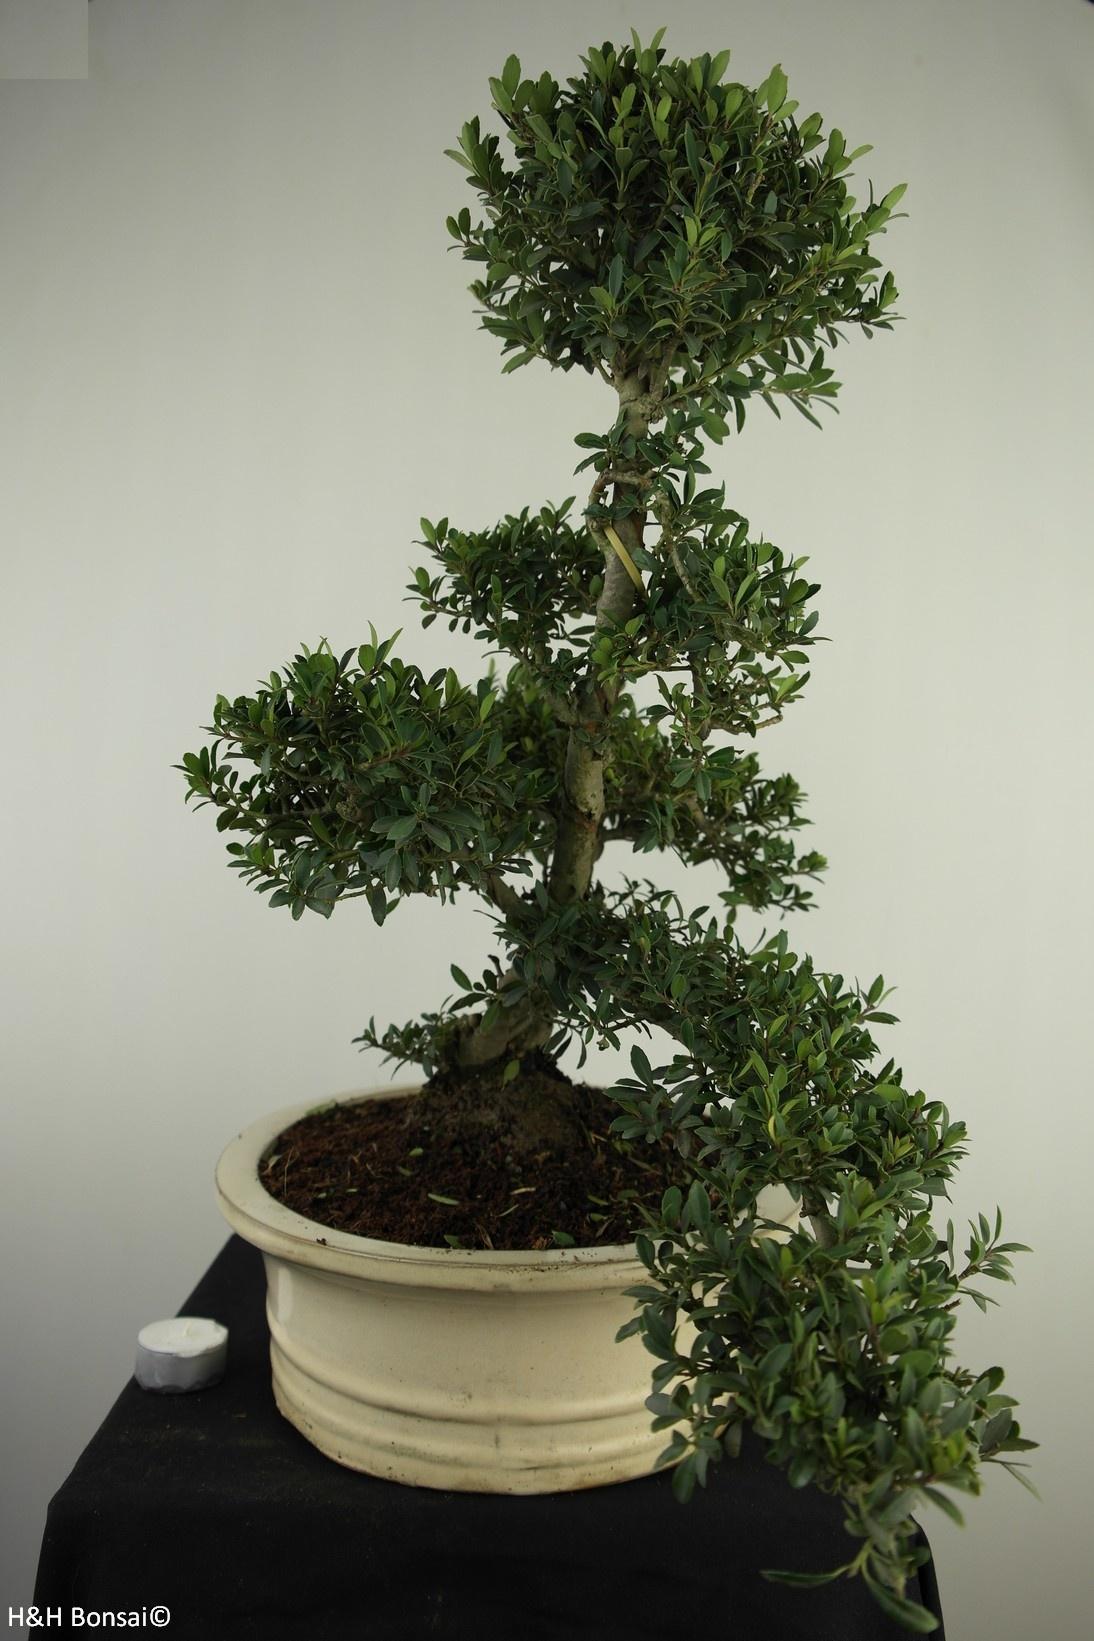 Bonsai Japanische Stechpalme, Ilex crenata, nr. 7742